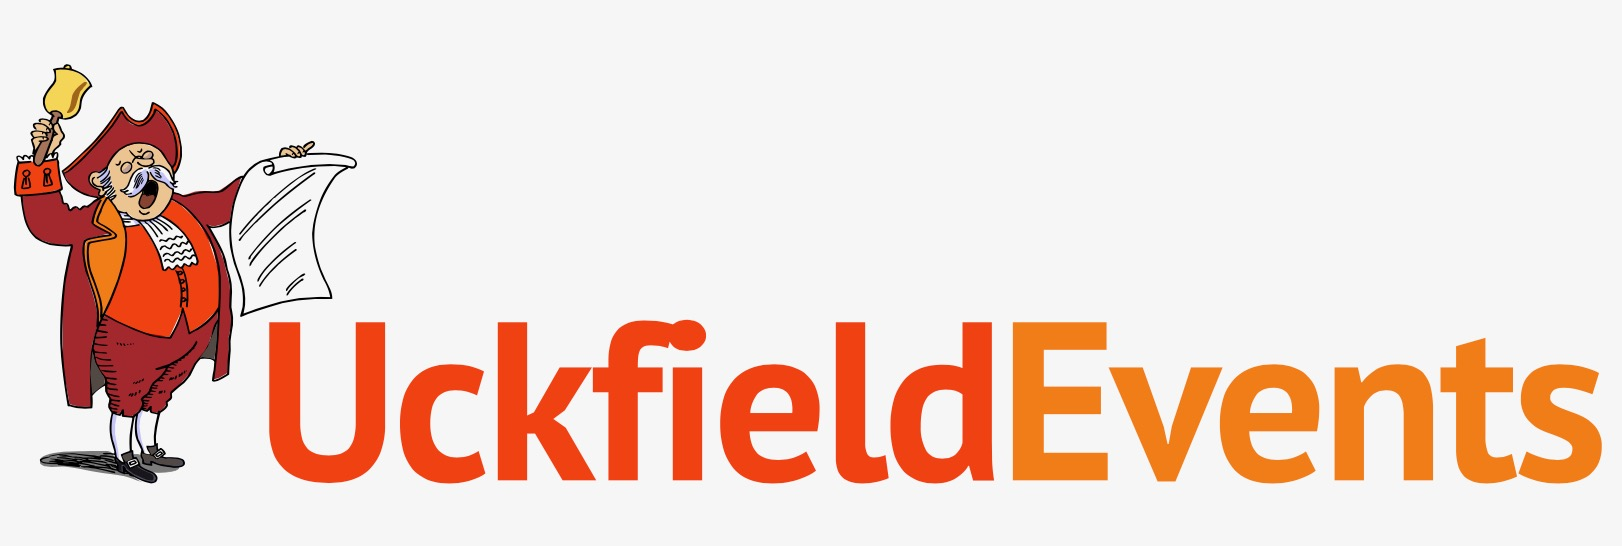 uckfield-events-logo